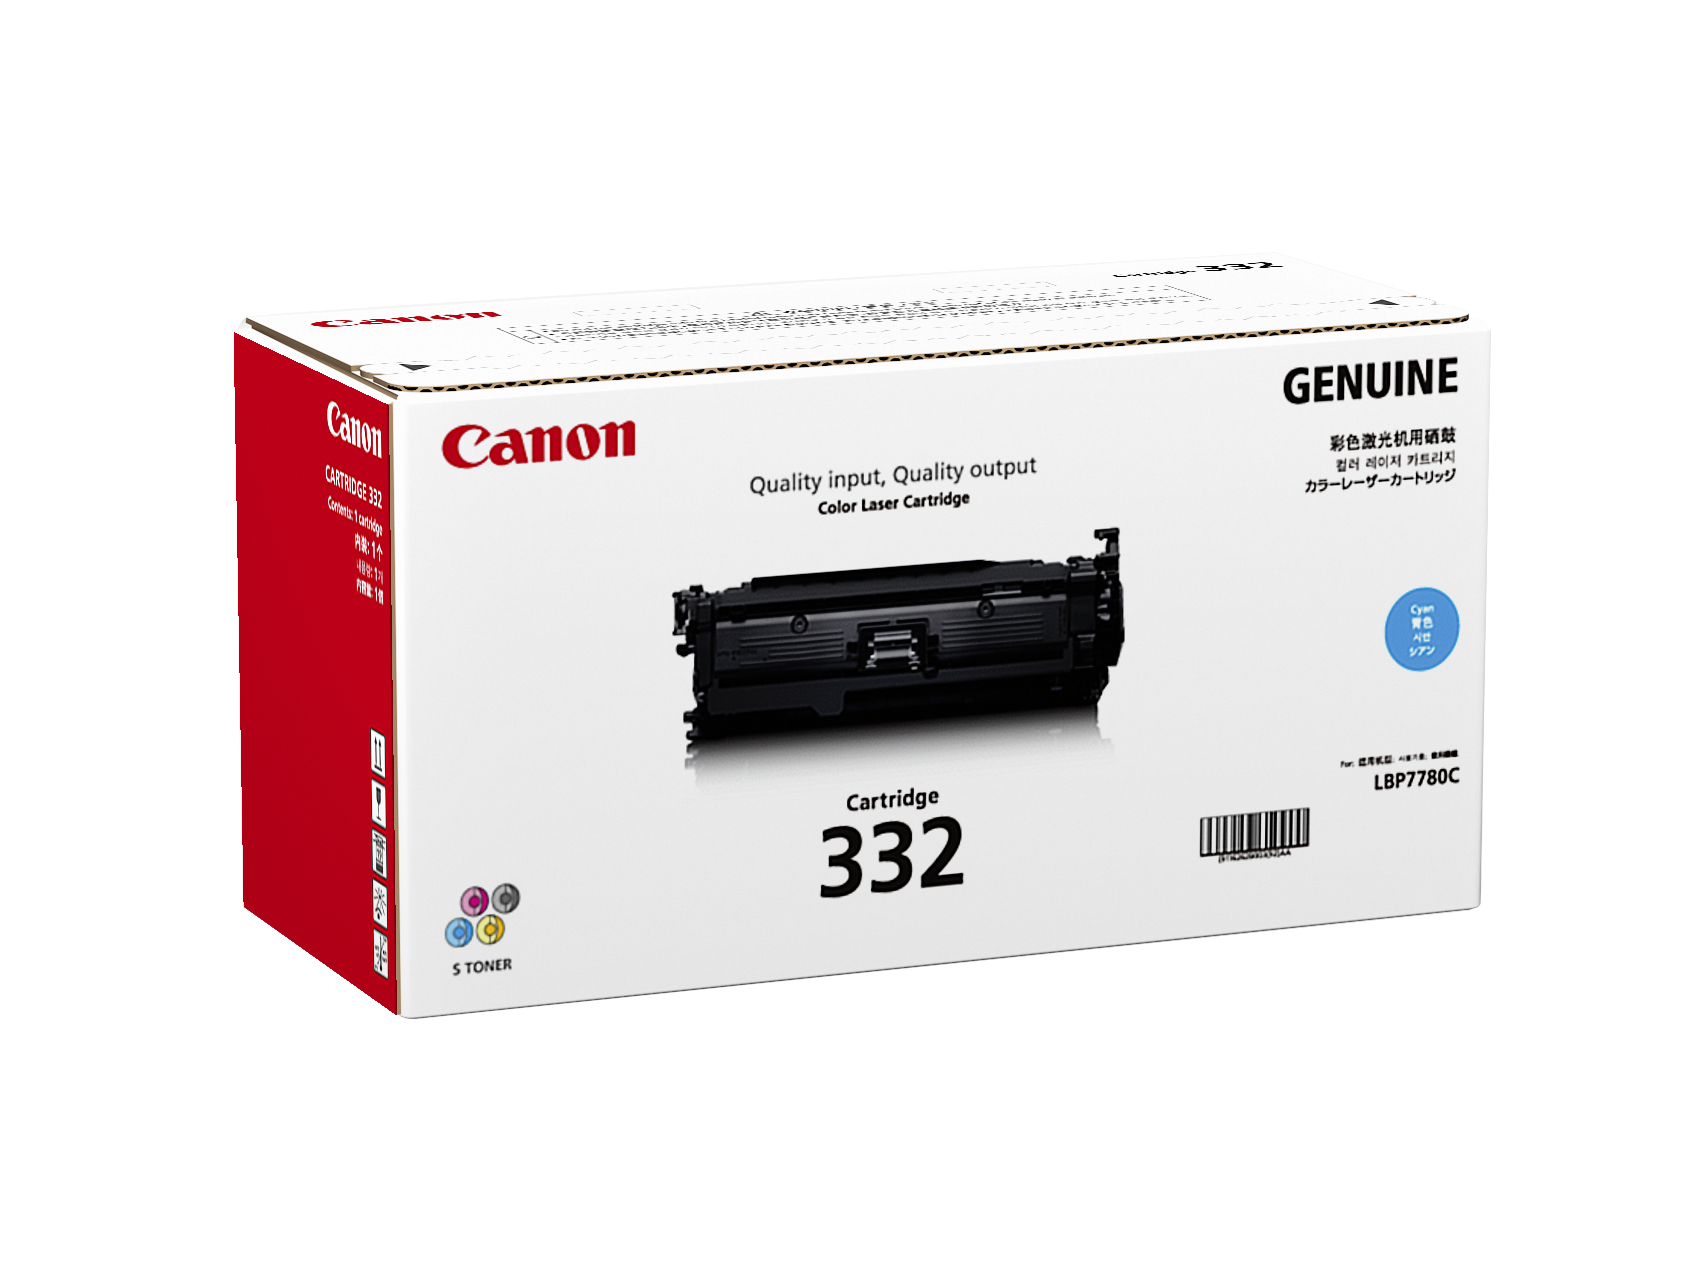 Canon CART332 Cyan Toner Cartridge (Original)